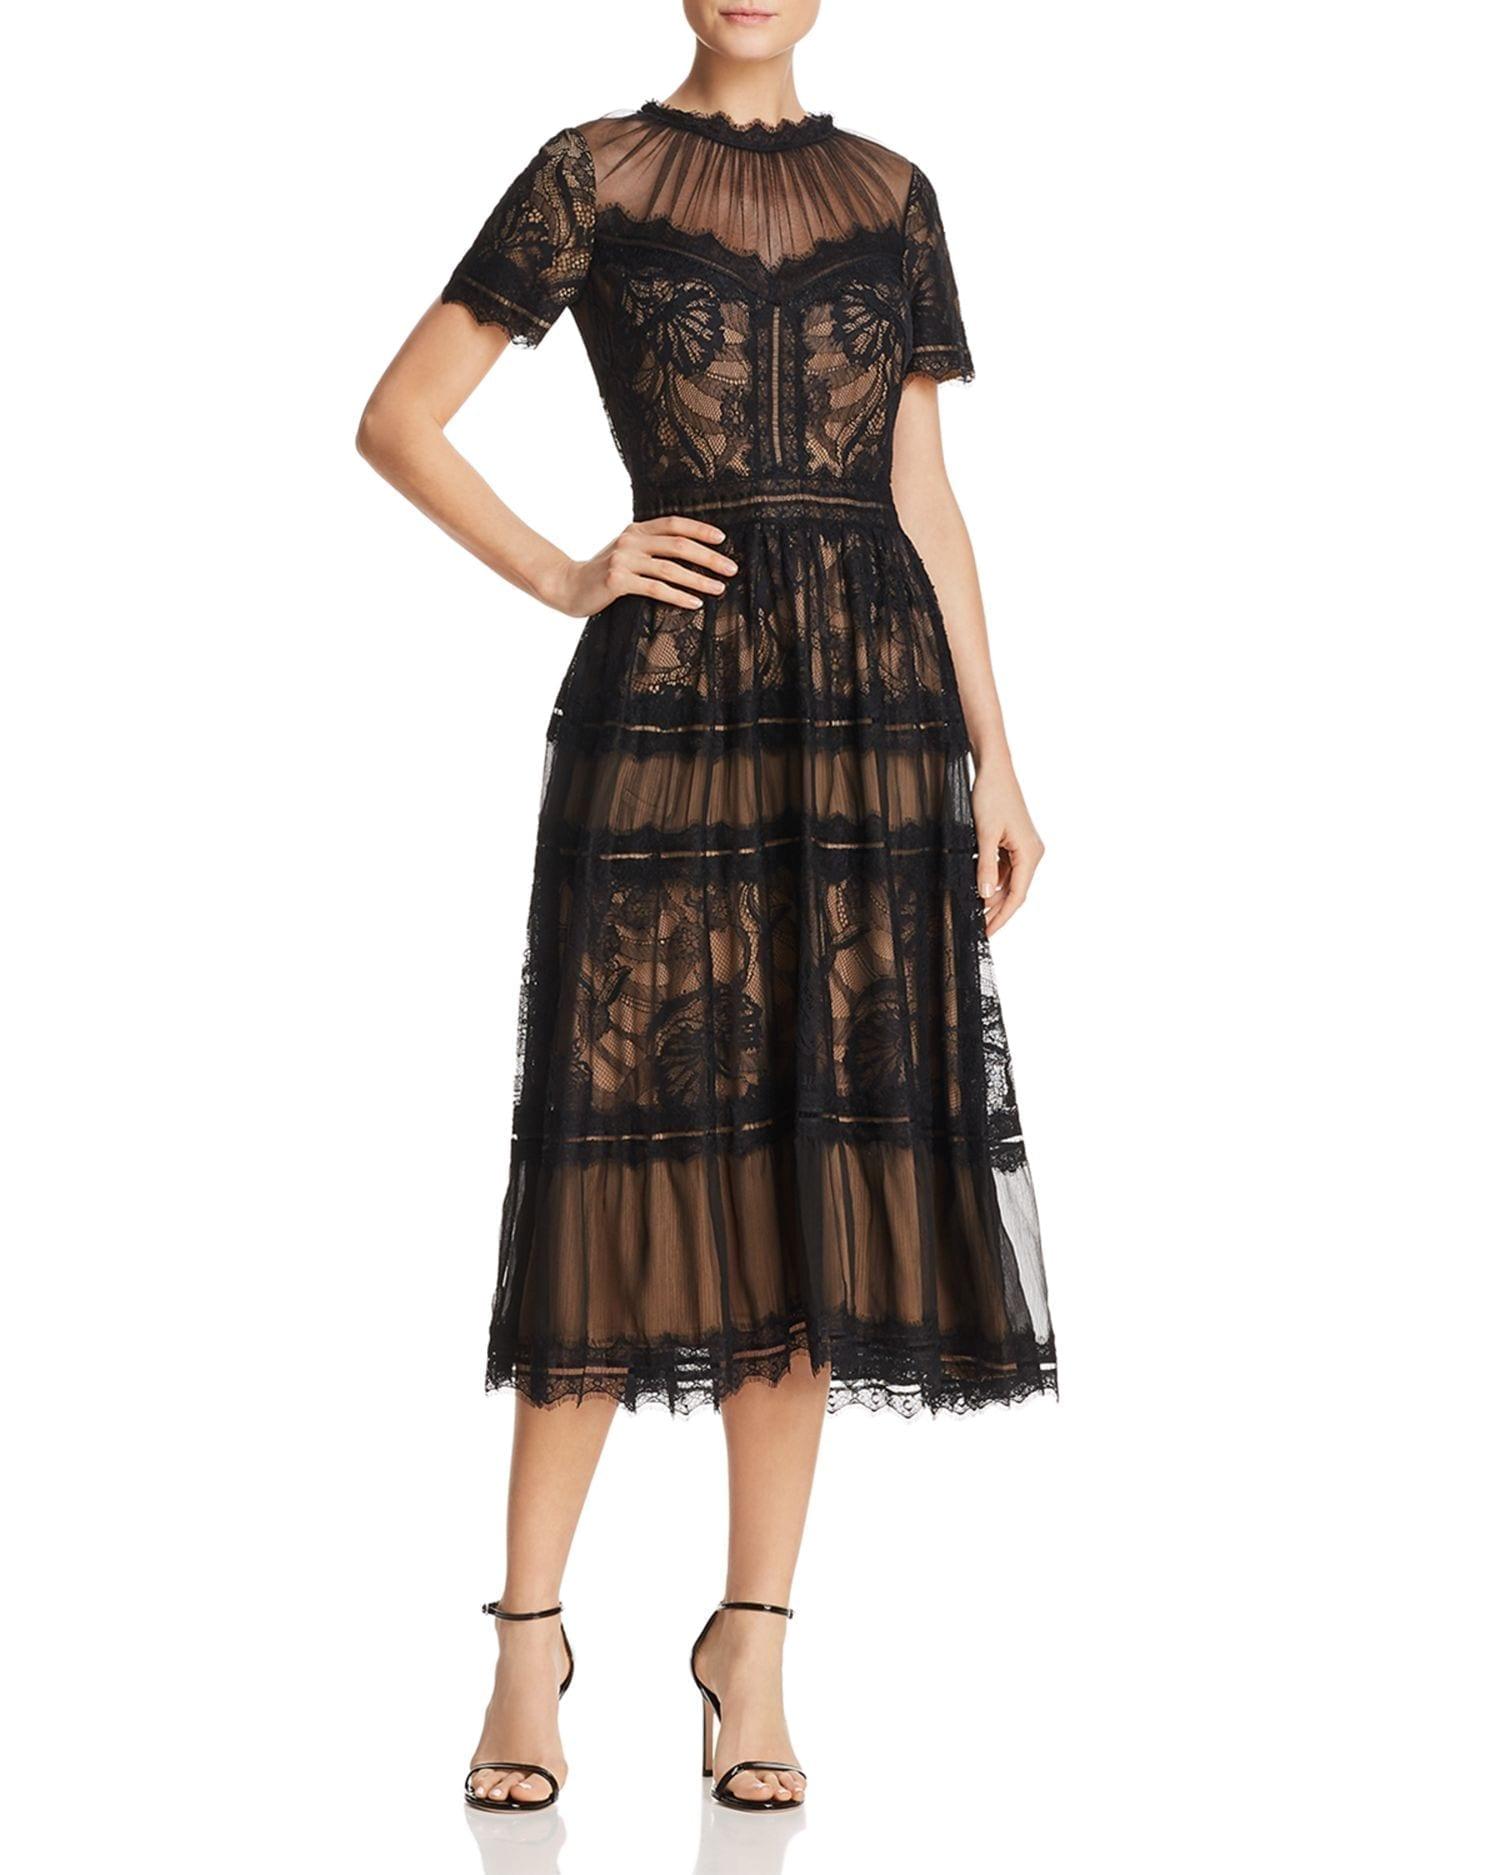 TADASHI SHOJI Lace Midi Black / Nude Dress